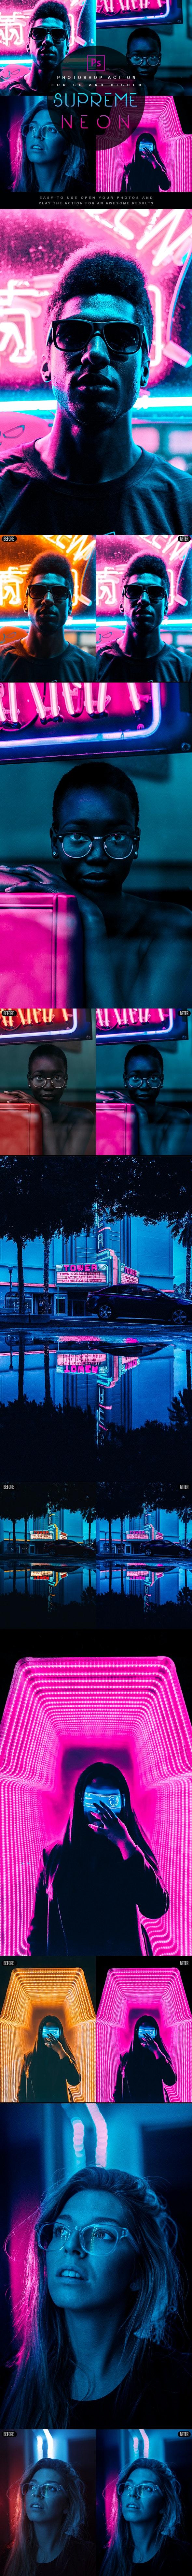 Supreme Neon - Premium Photoshop Action - Photo Effects Actions